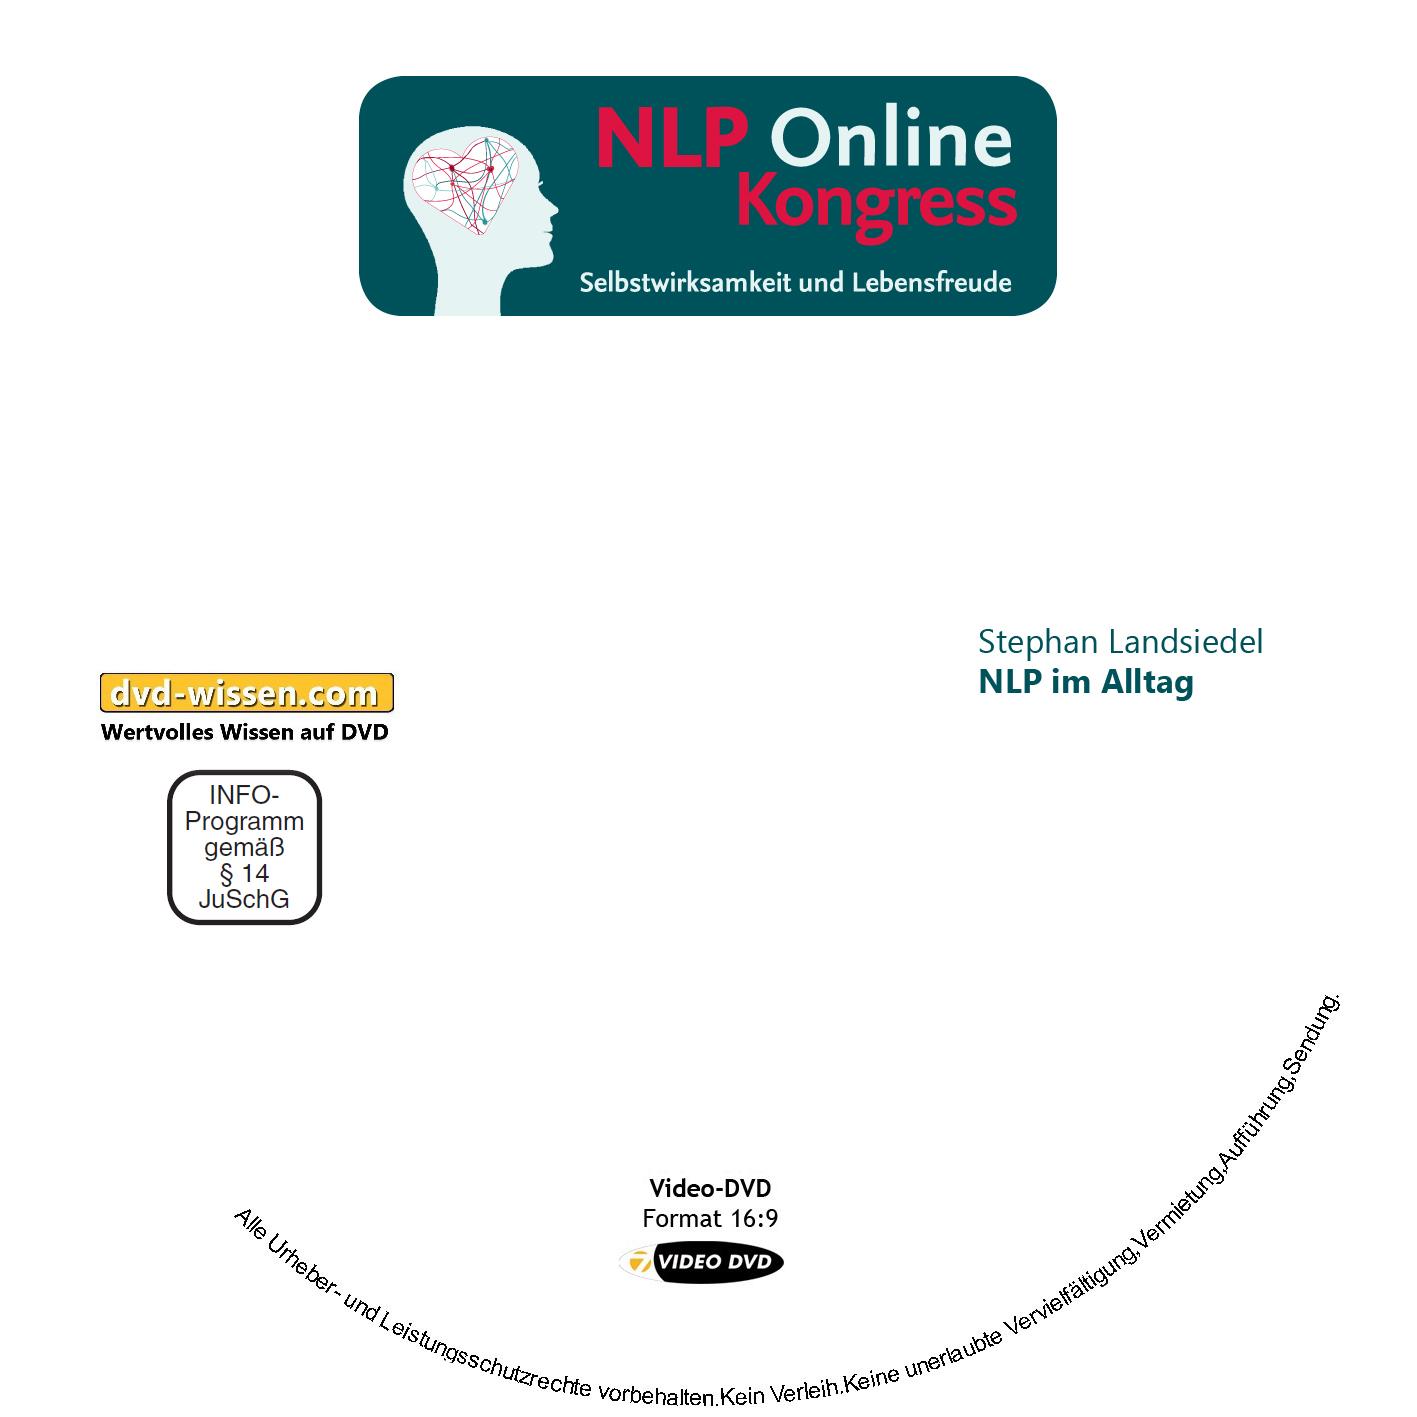 Stephan Landsiedel: NLP im Alltag